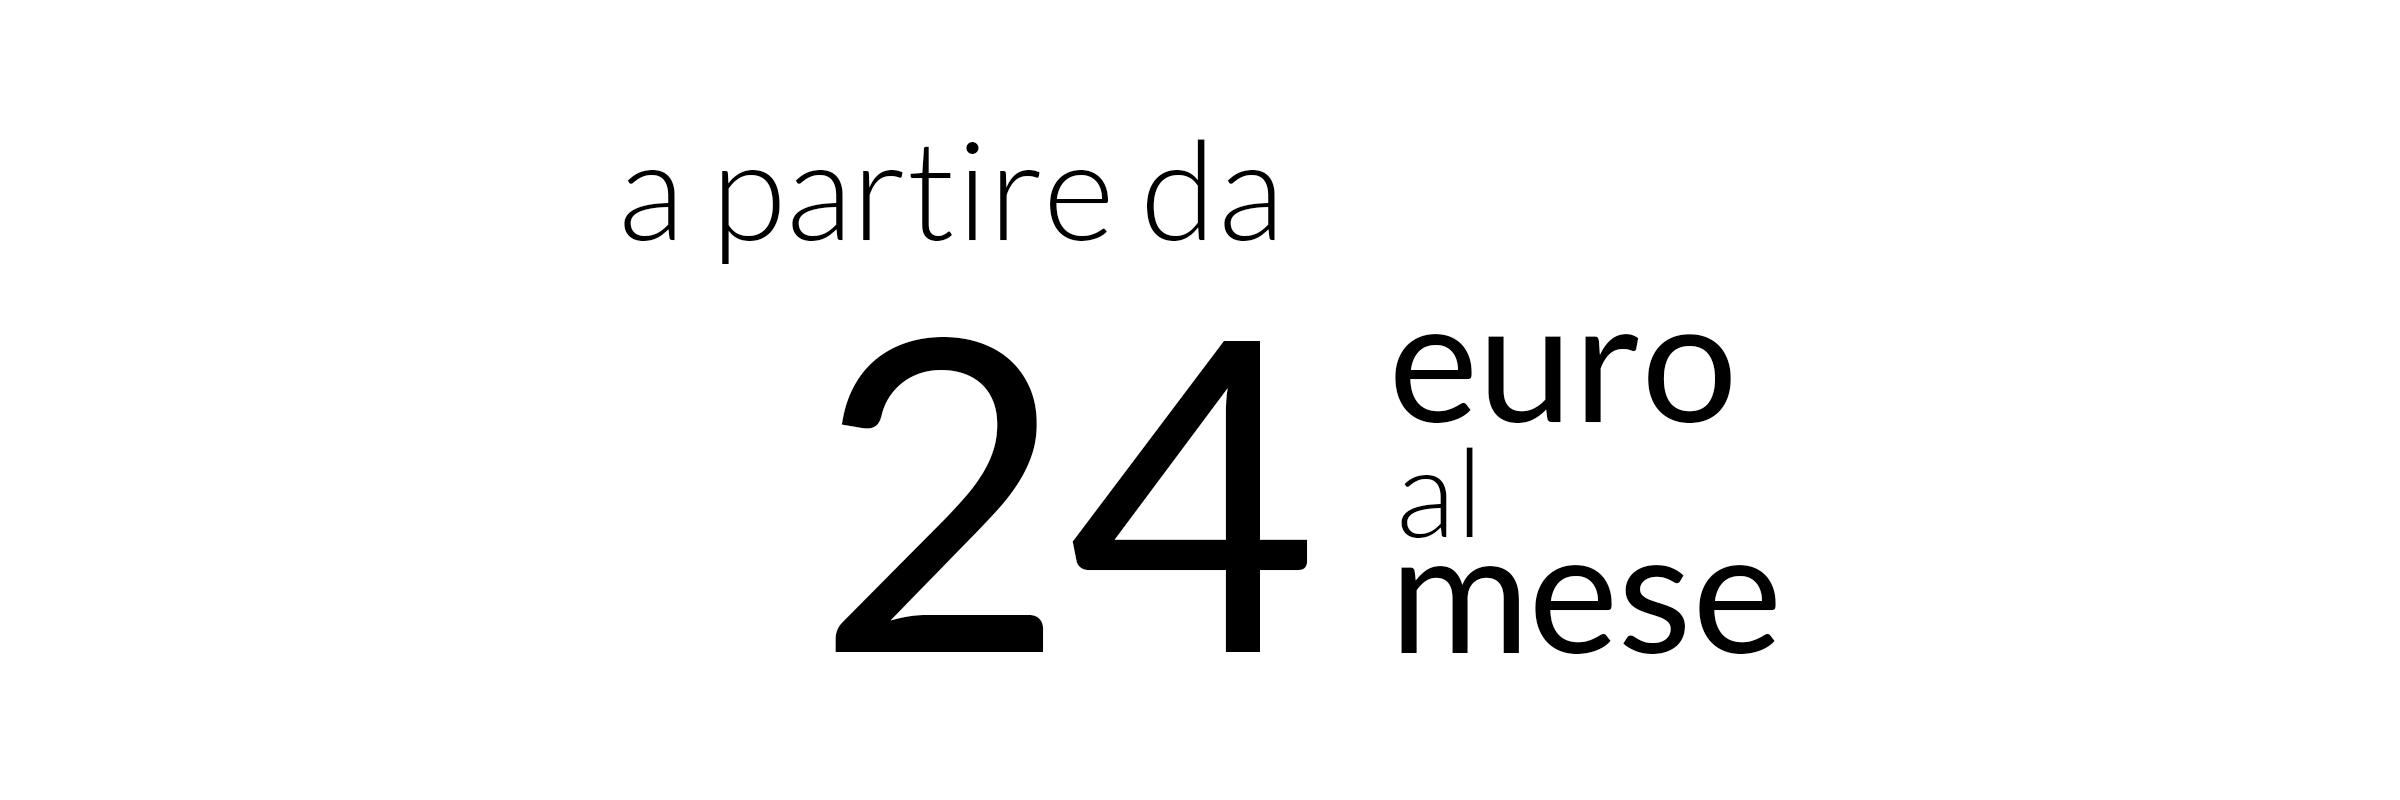 A partire da 24 euro al mese